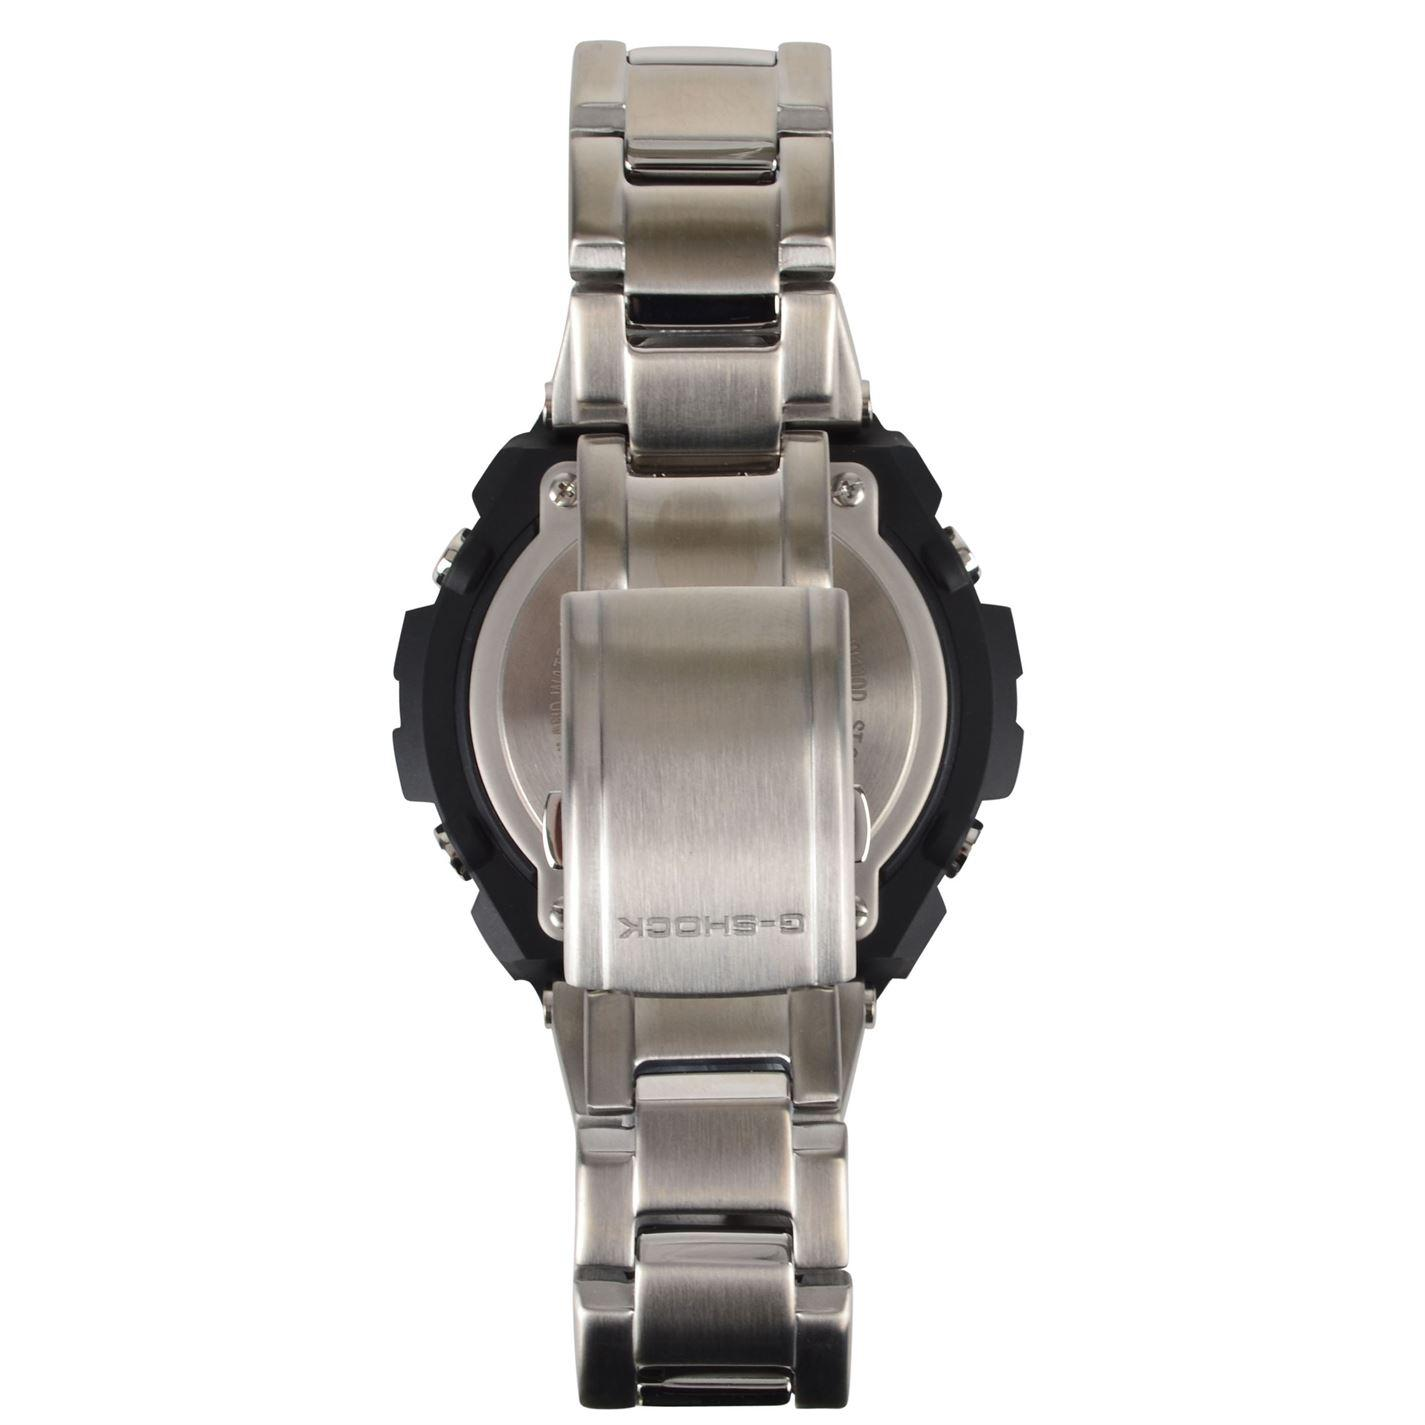 788f772c421 G-Shock Gst W110d 1aer Watch in Metallic for Men - Lyst